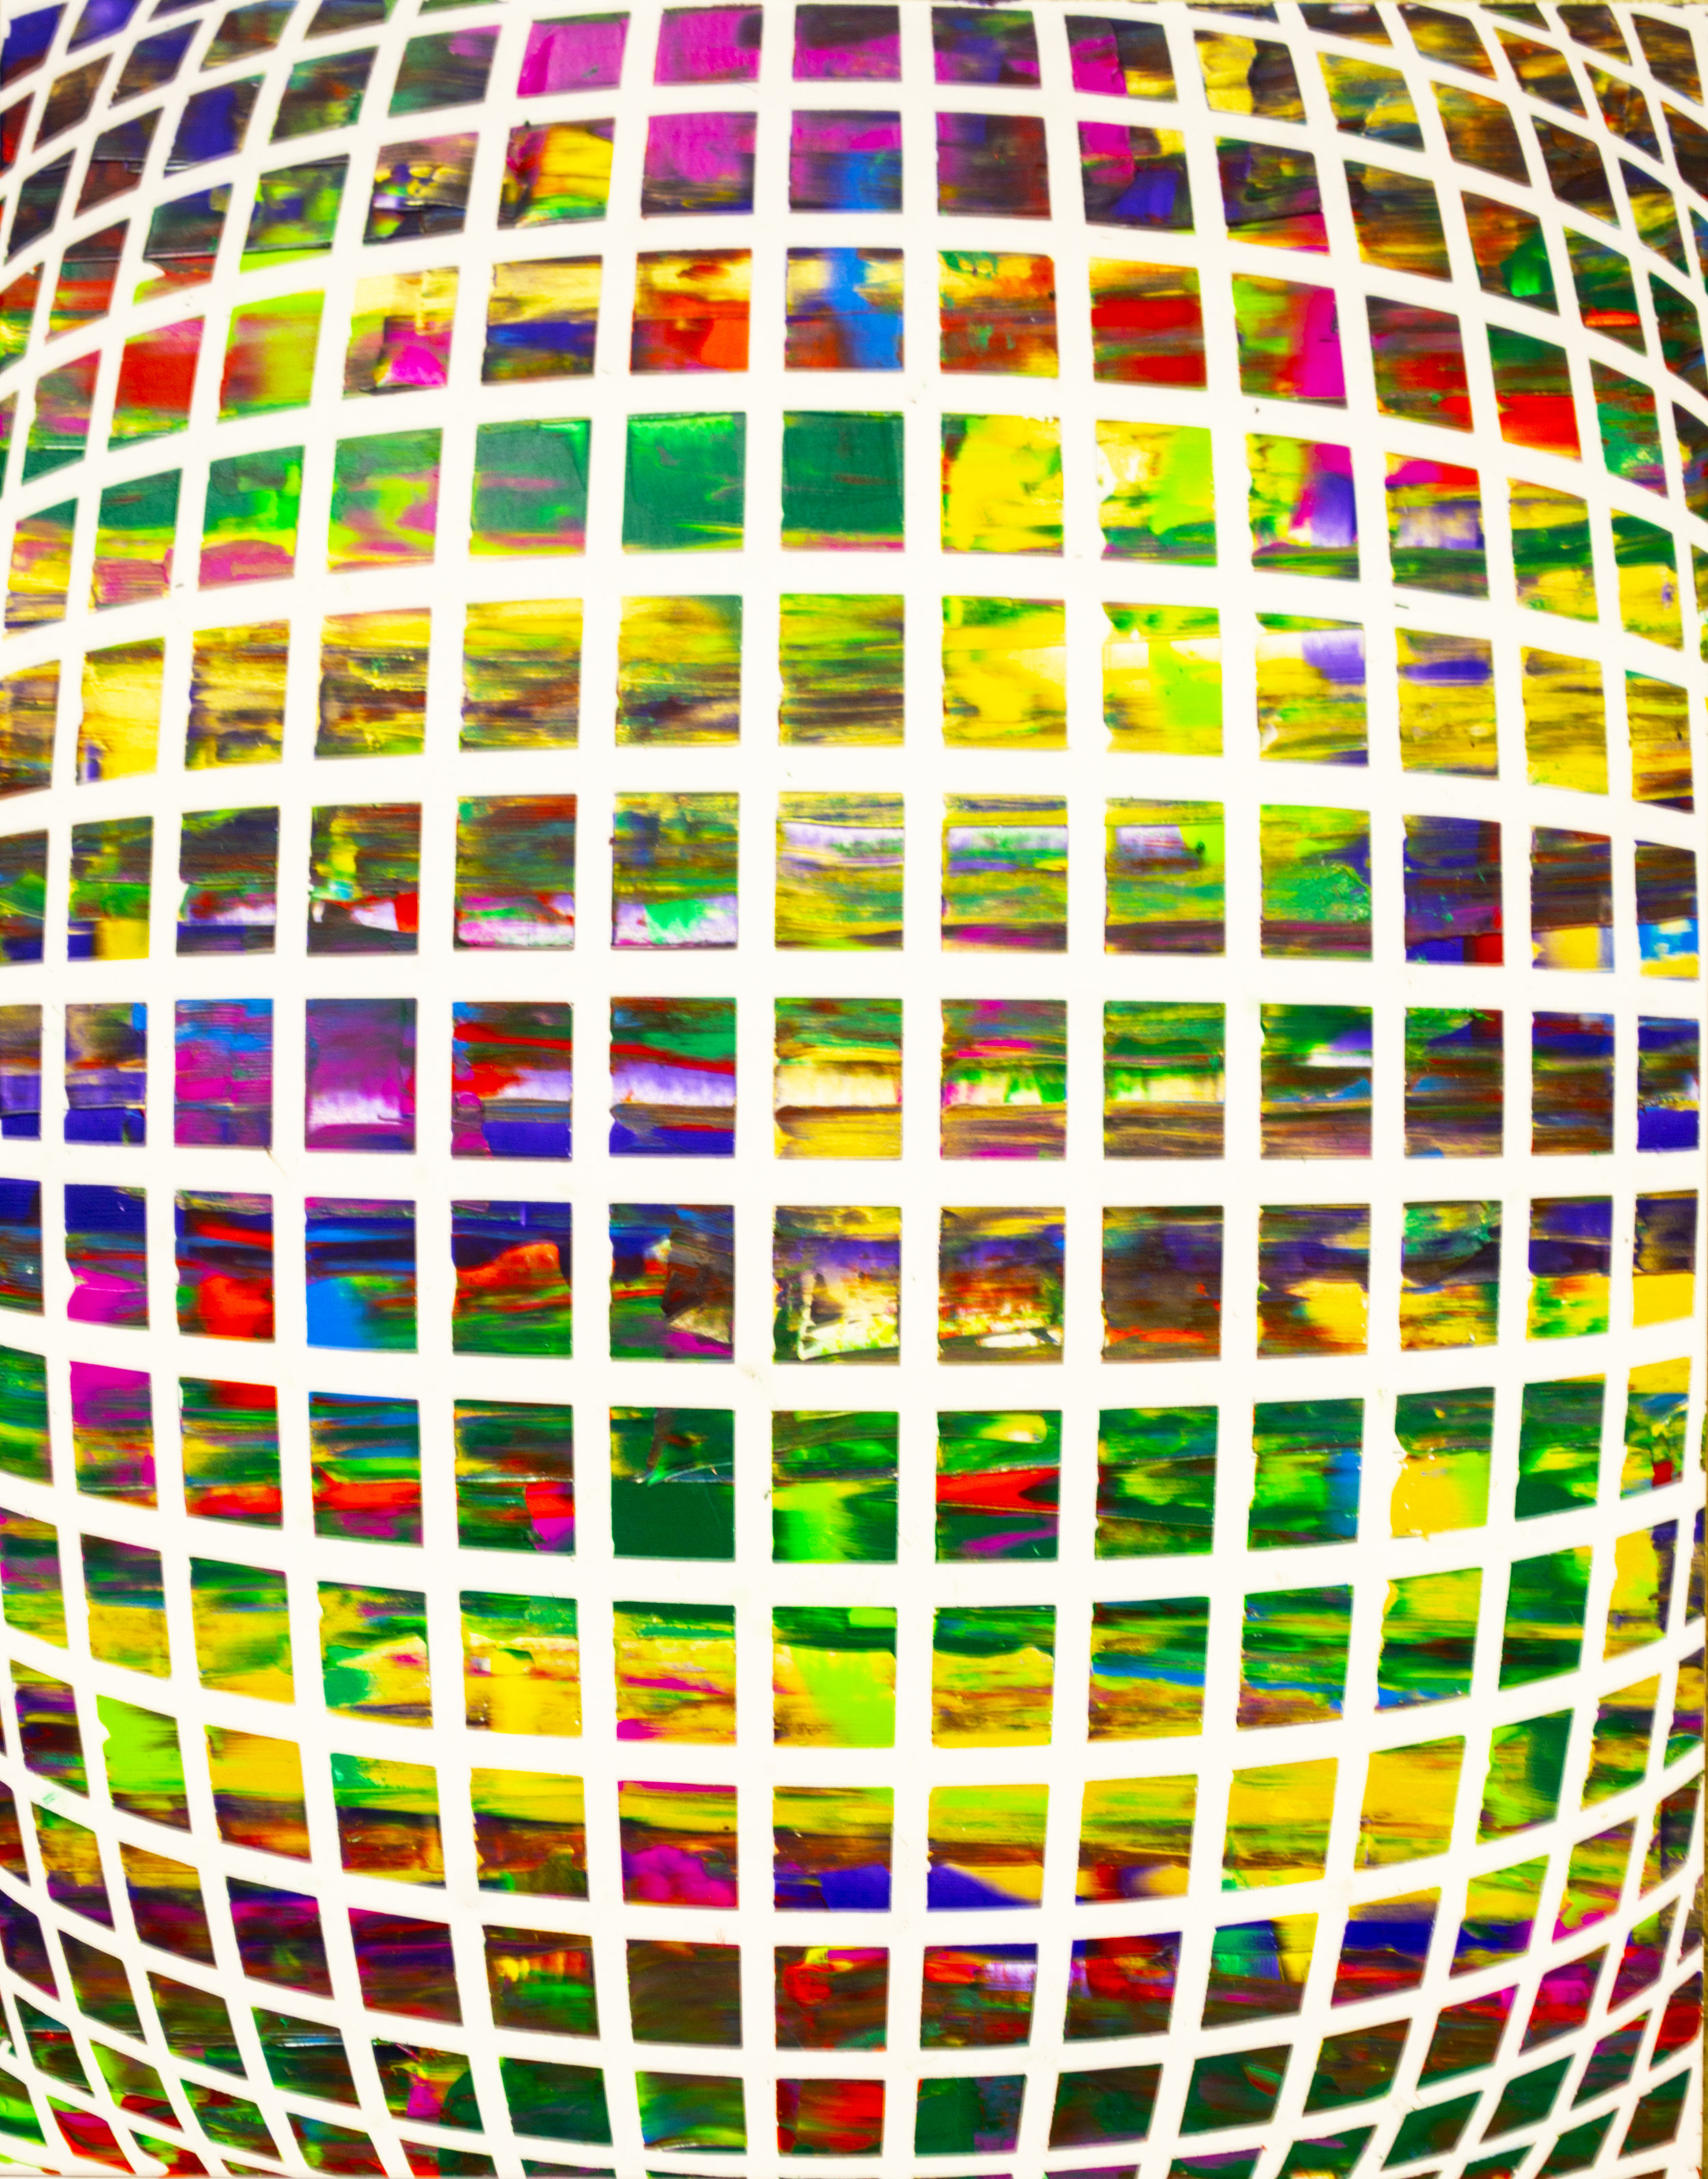 HUE Gallery of Contemporary Art - Sean Christopher Ward - Planet Disco - Acrylic on MDF - 11x14 - 2018 - $300.jpg